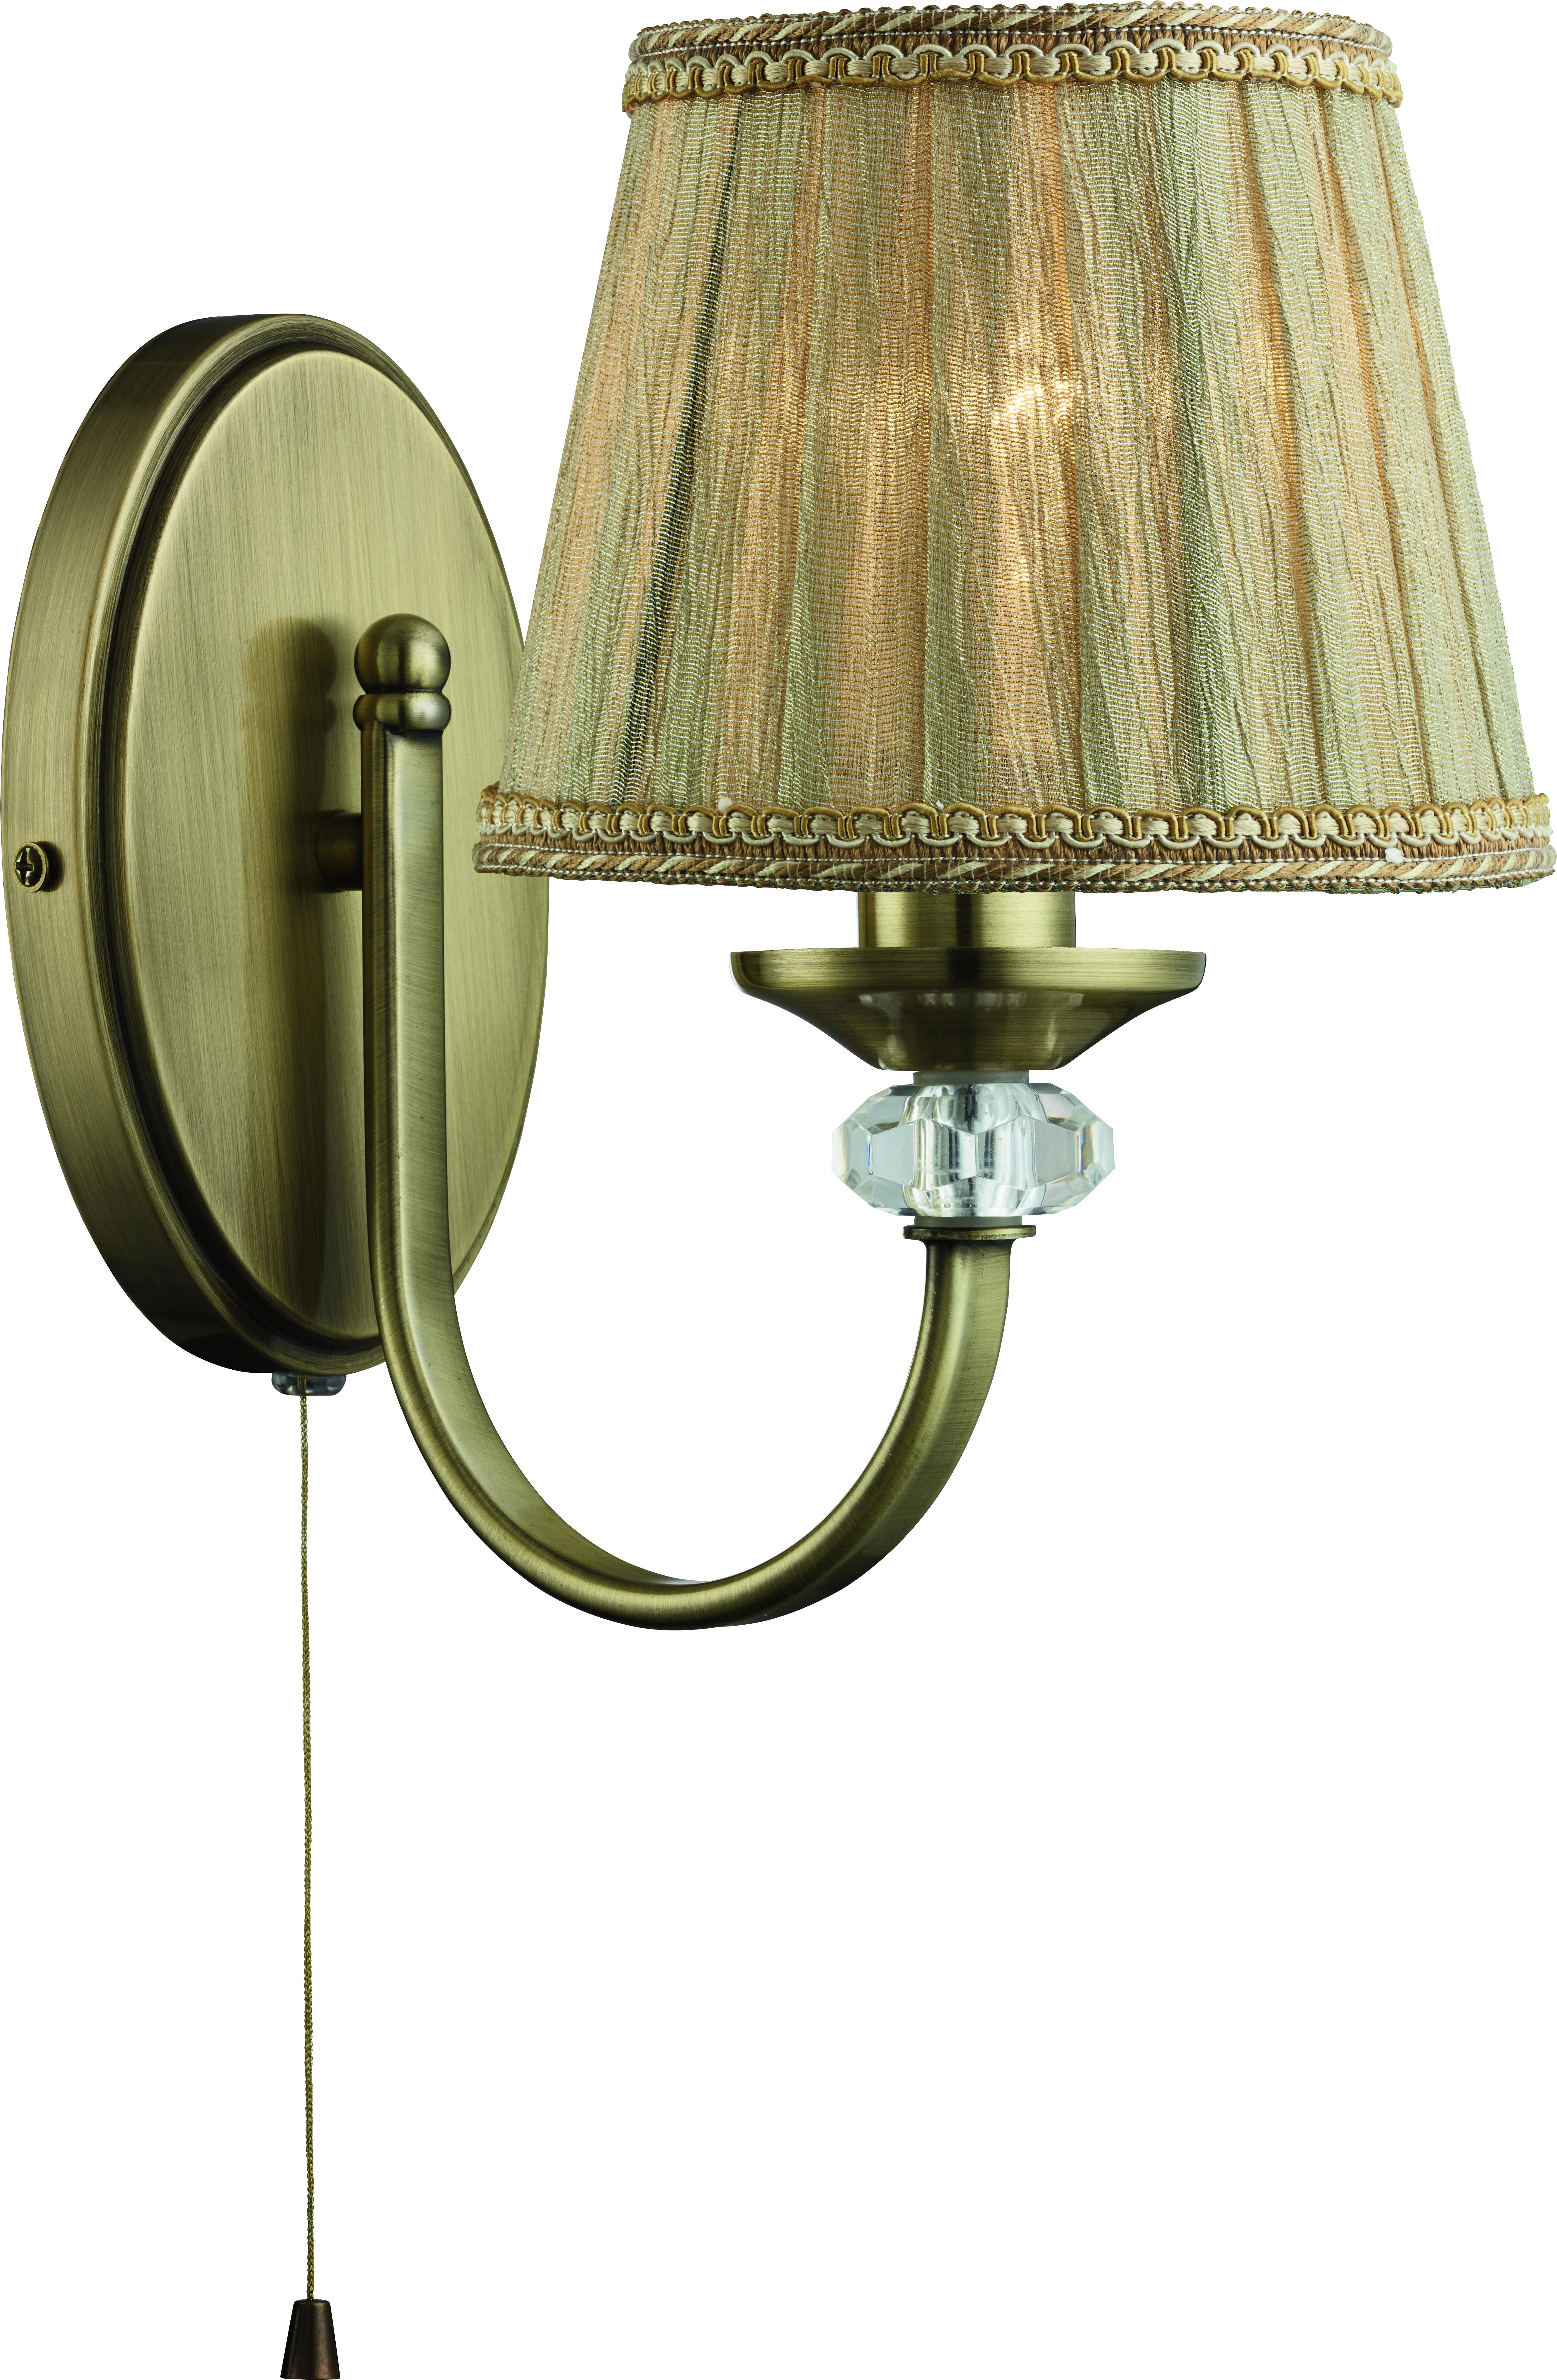 Бра Arte lamp A1180ap-1ab светильник настенный arte lamp sylvia a1180ap 1ab 4640015248774